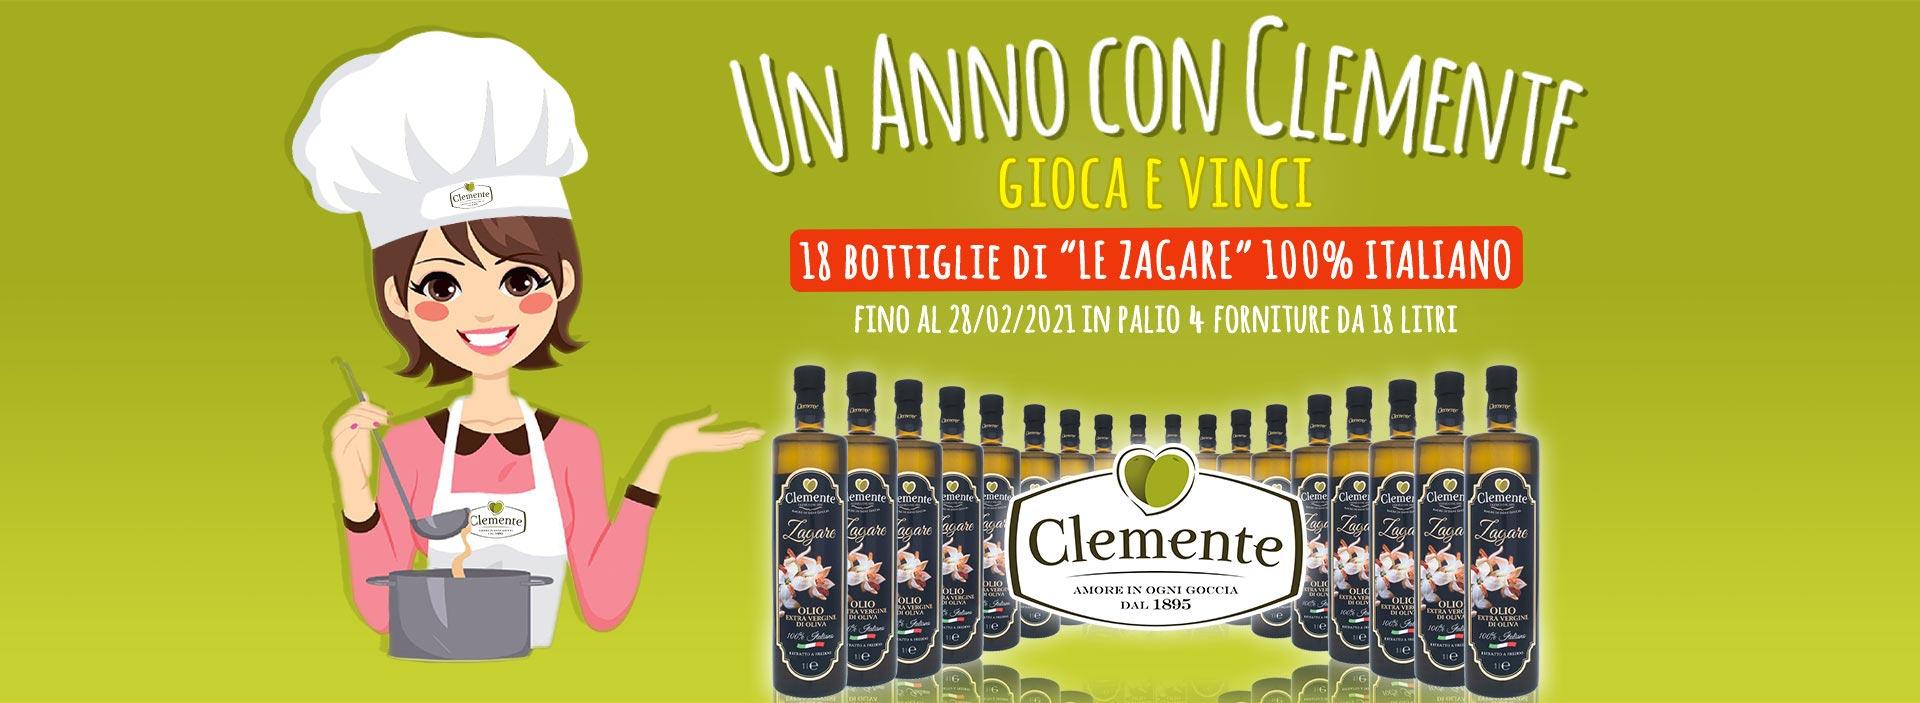 Un Anno con Clemente image